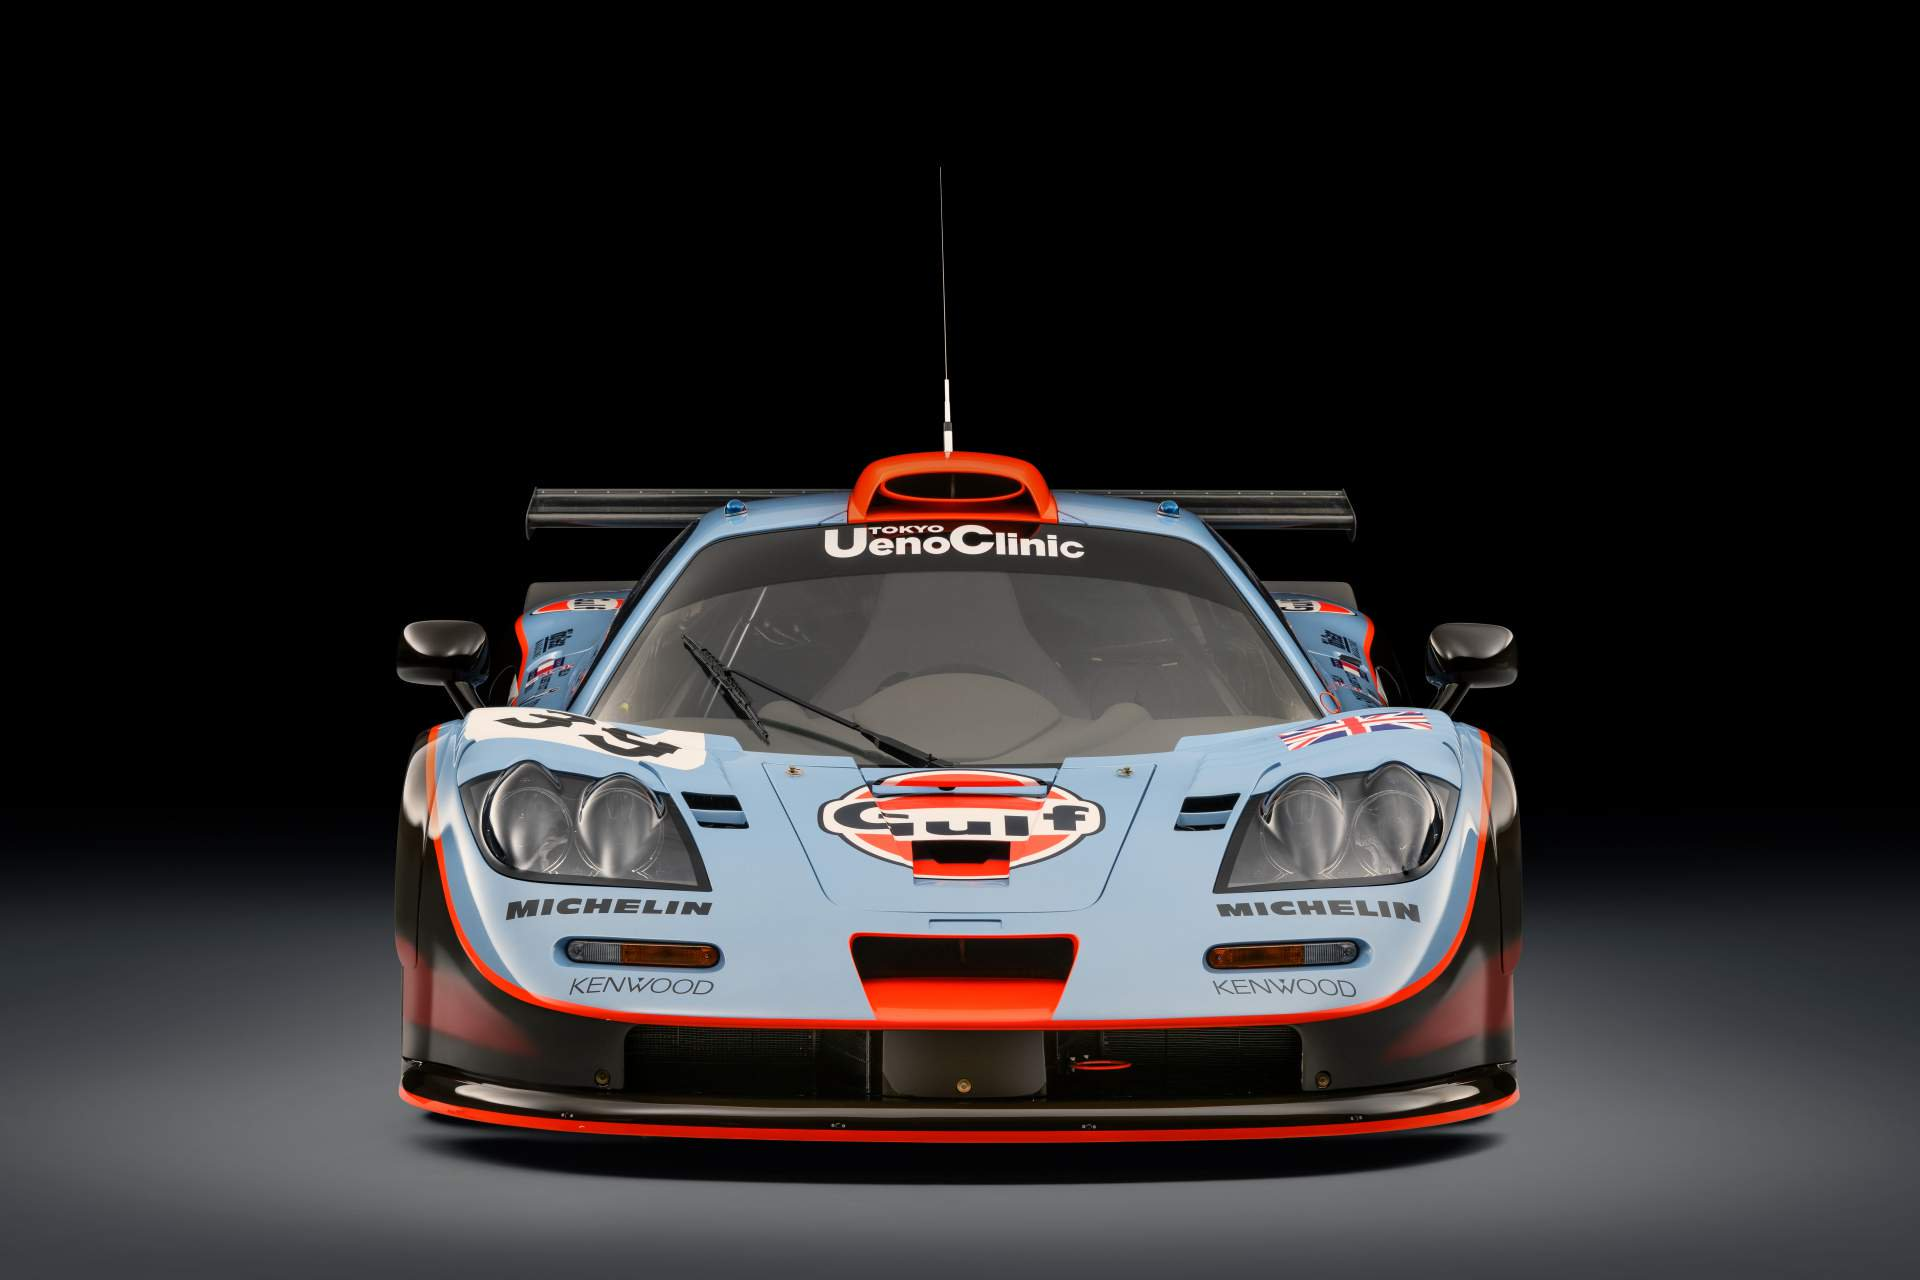 McLaren F1 GTR Longtail 25R restored by MSO (1)